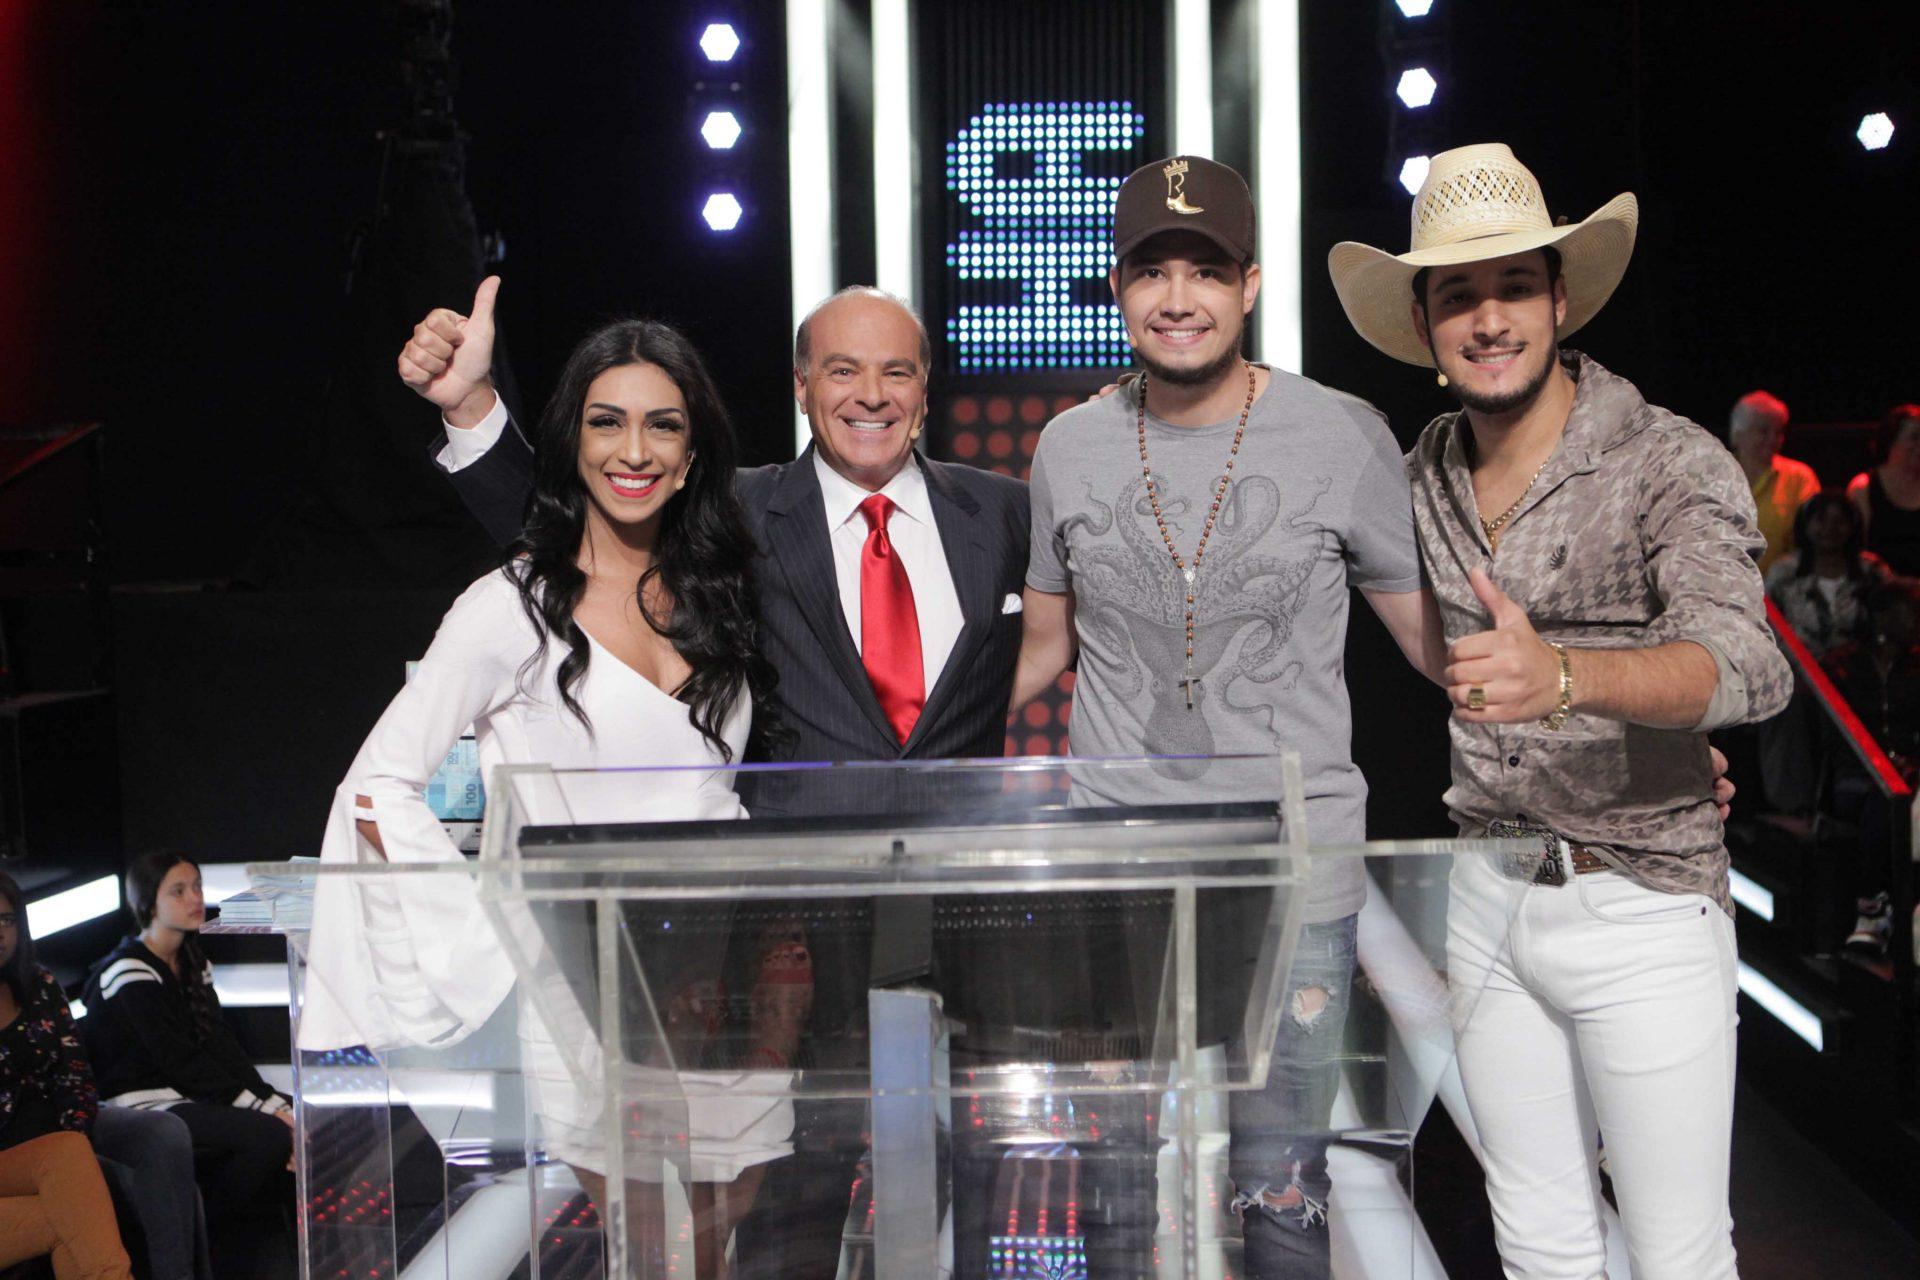 Foto: Artur Igrecias/RedeTV!